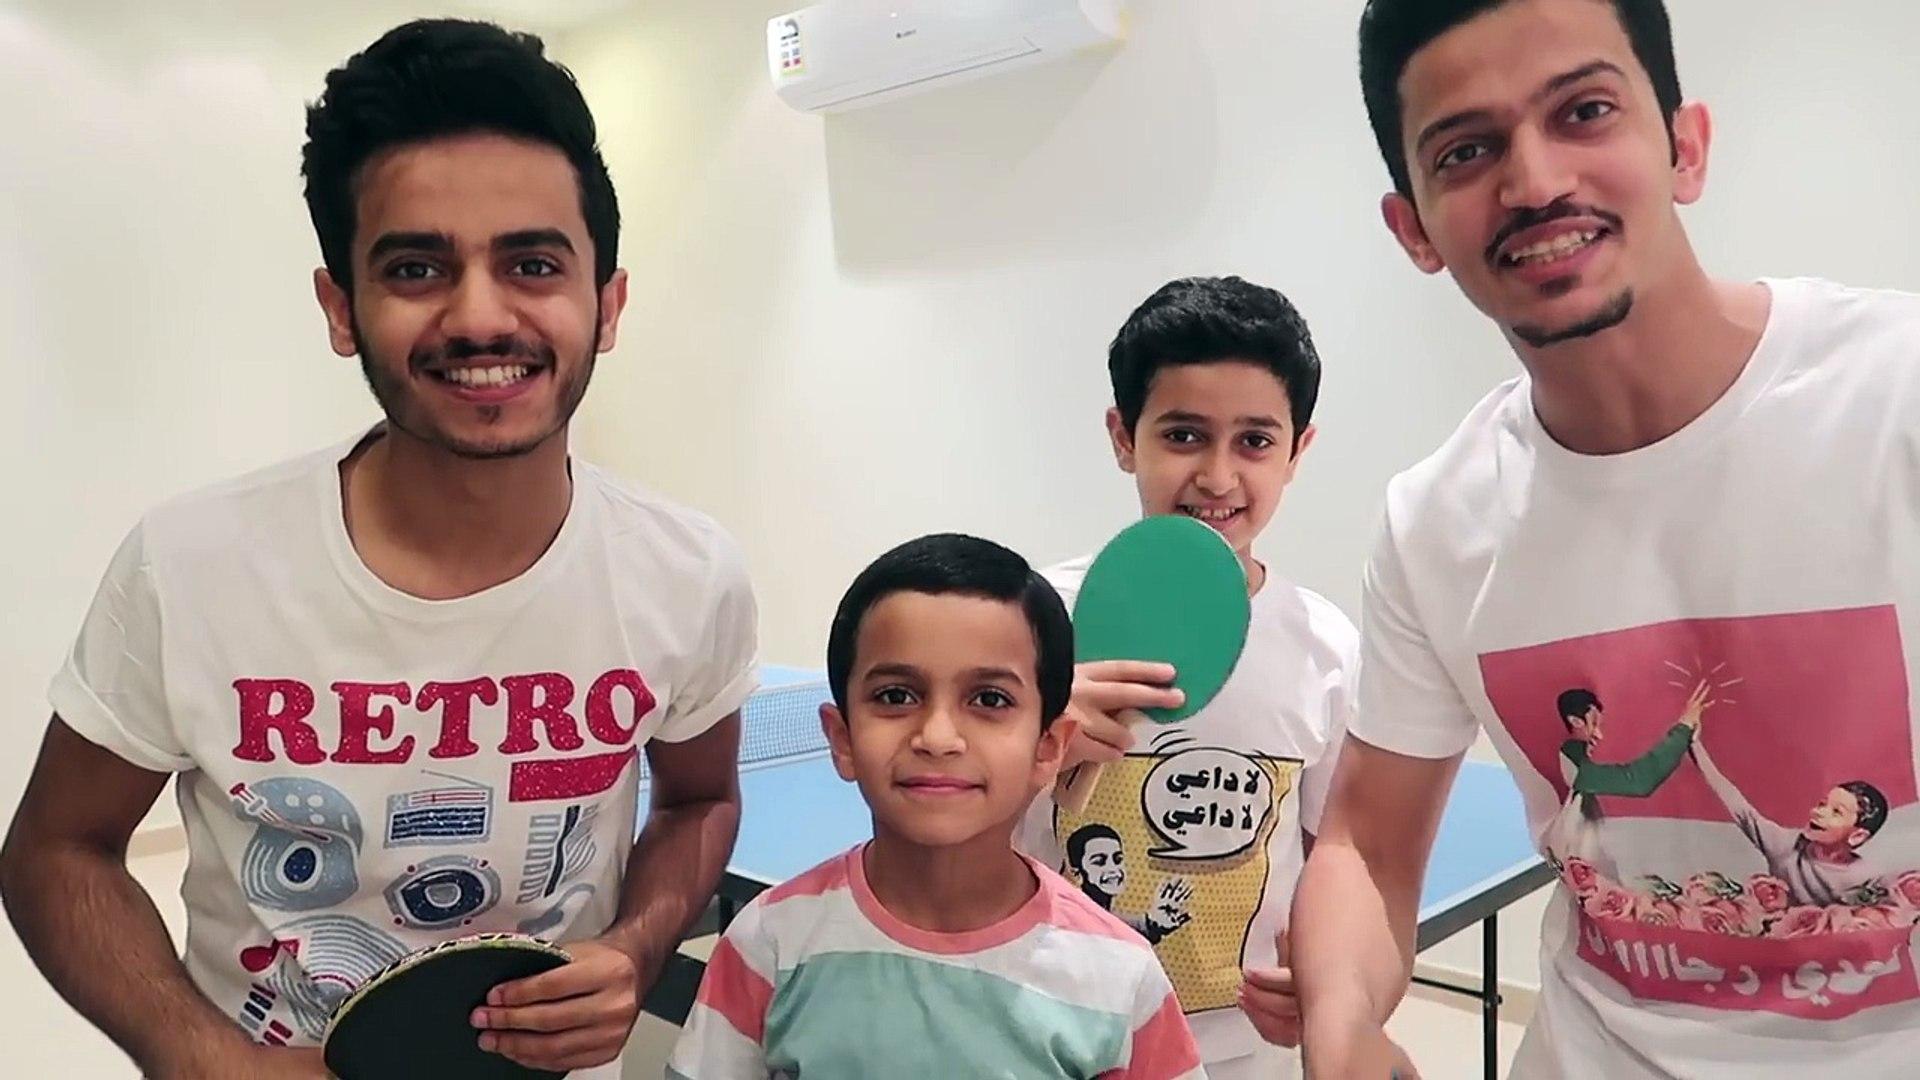 فوانيس سعود واخوانه تحدي التنس فيديو Dailymotion